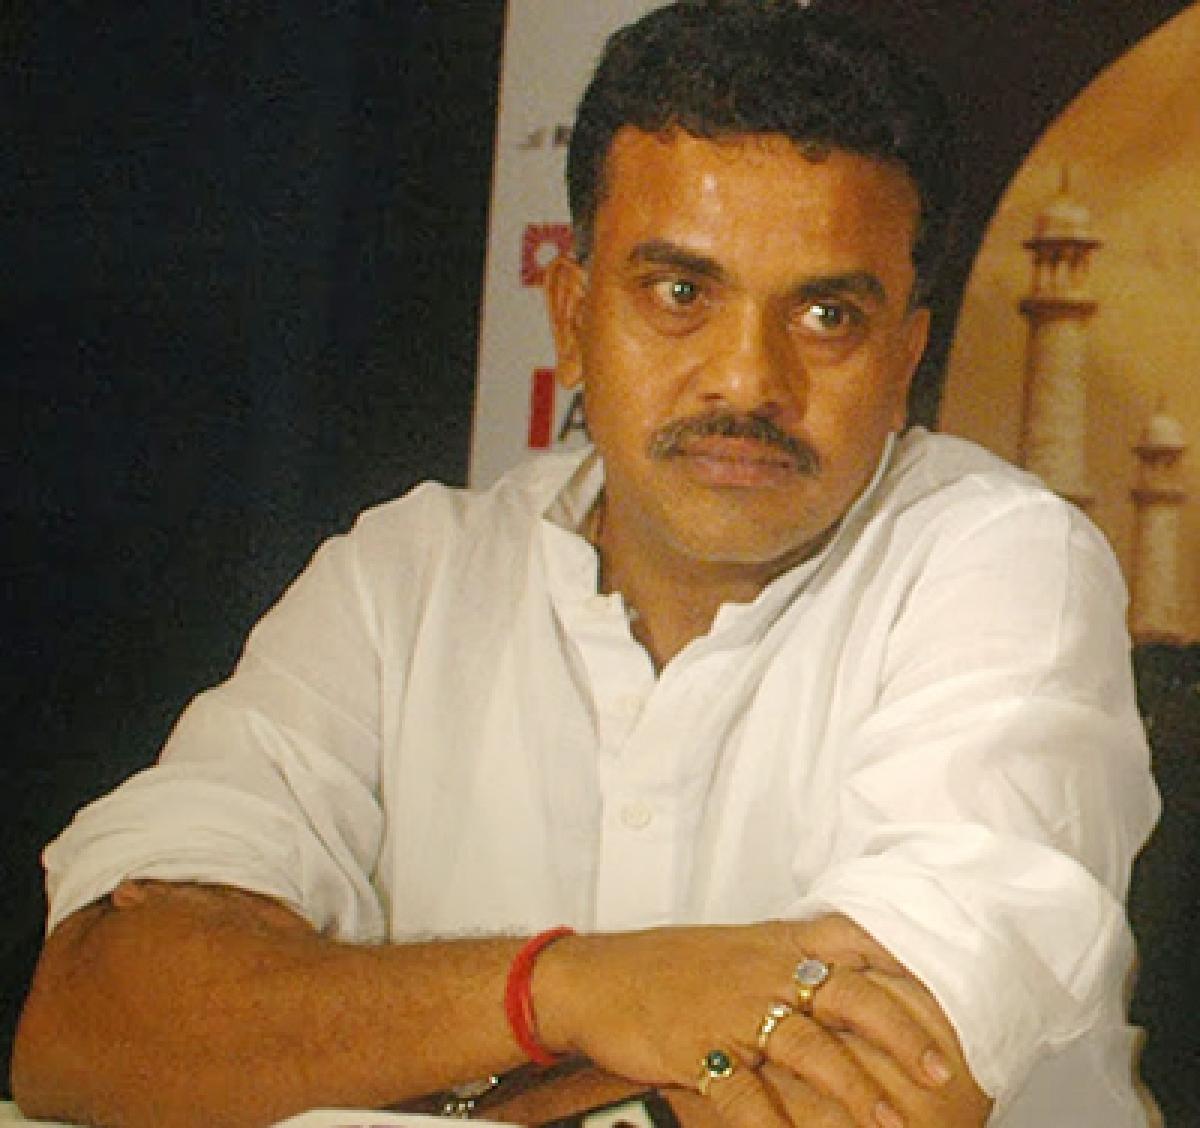 Top Shiv Sena leaders are involved in tablet scam: Sanjay Nirupam, Congress